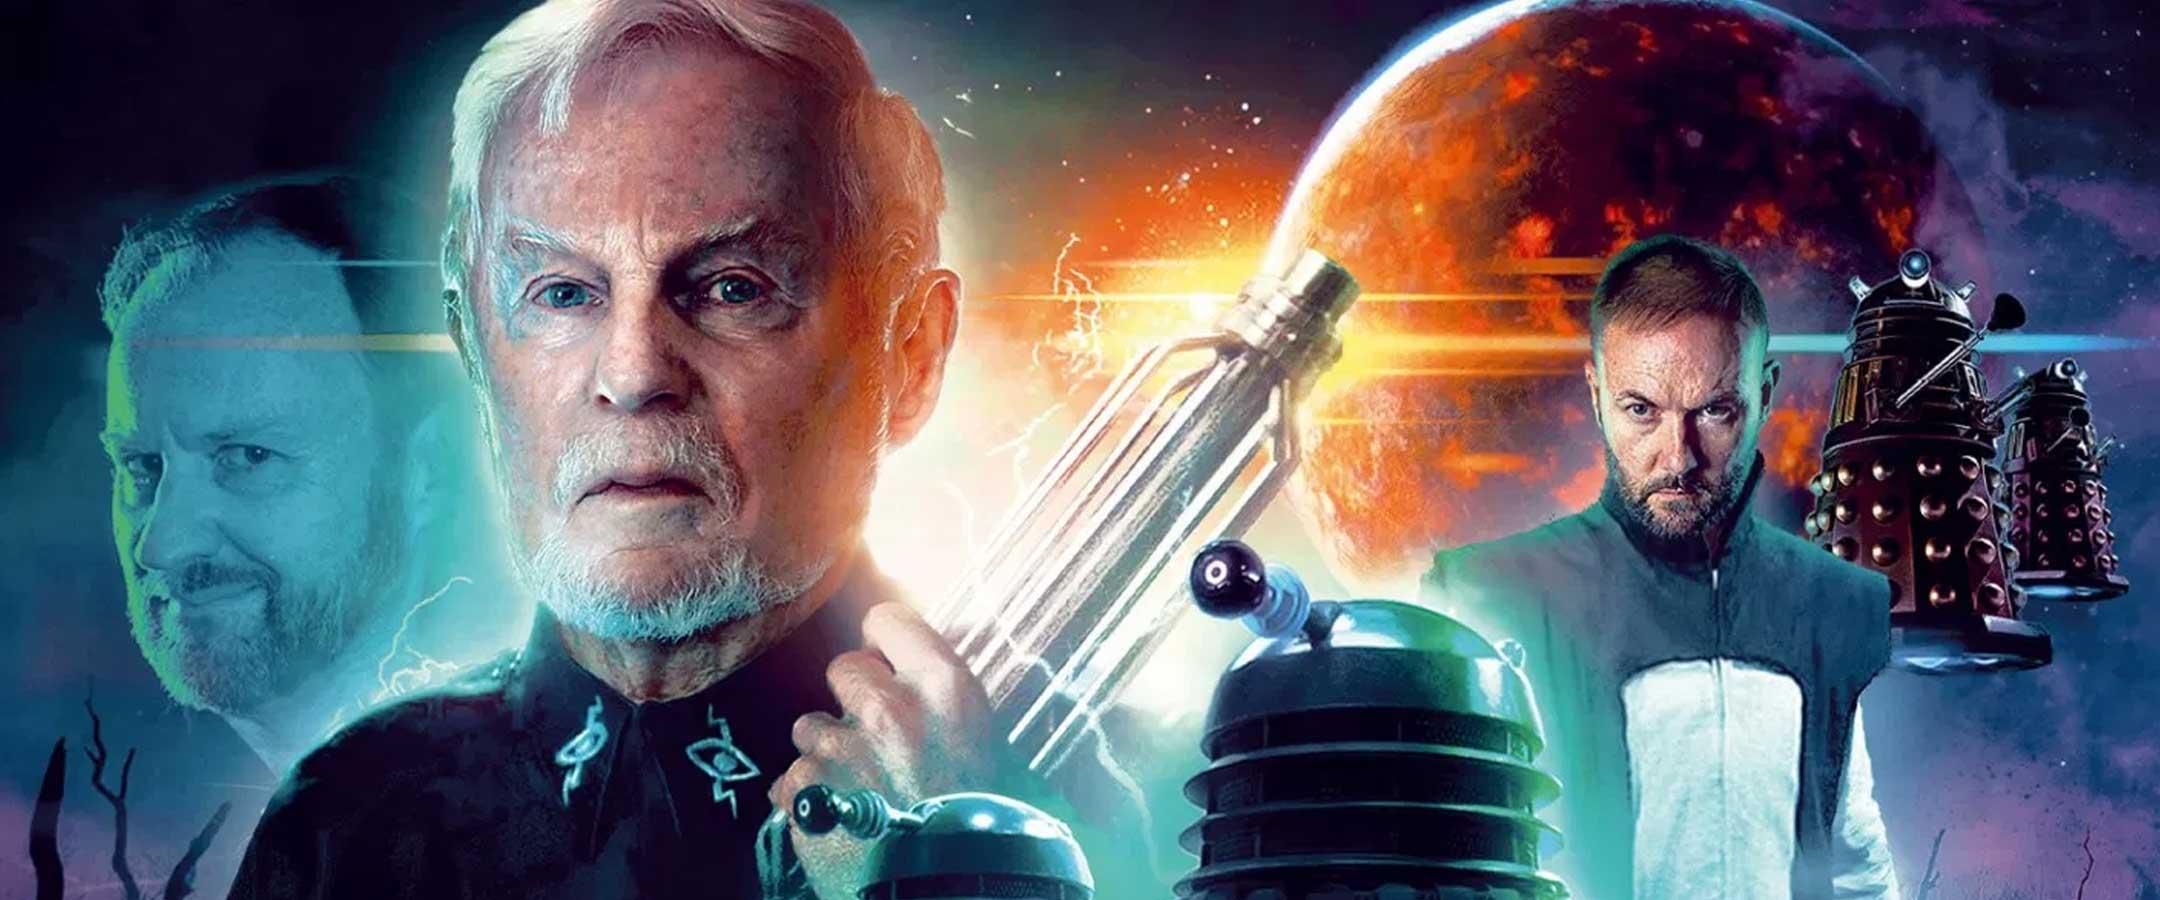 The War Master - Anti-Genesis Review